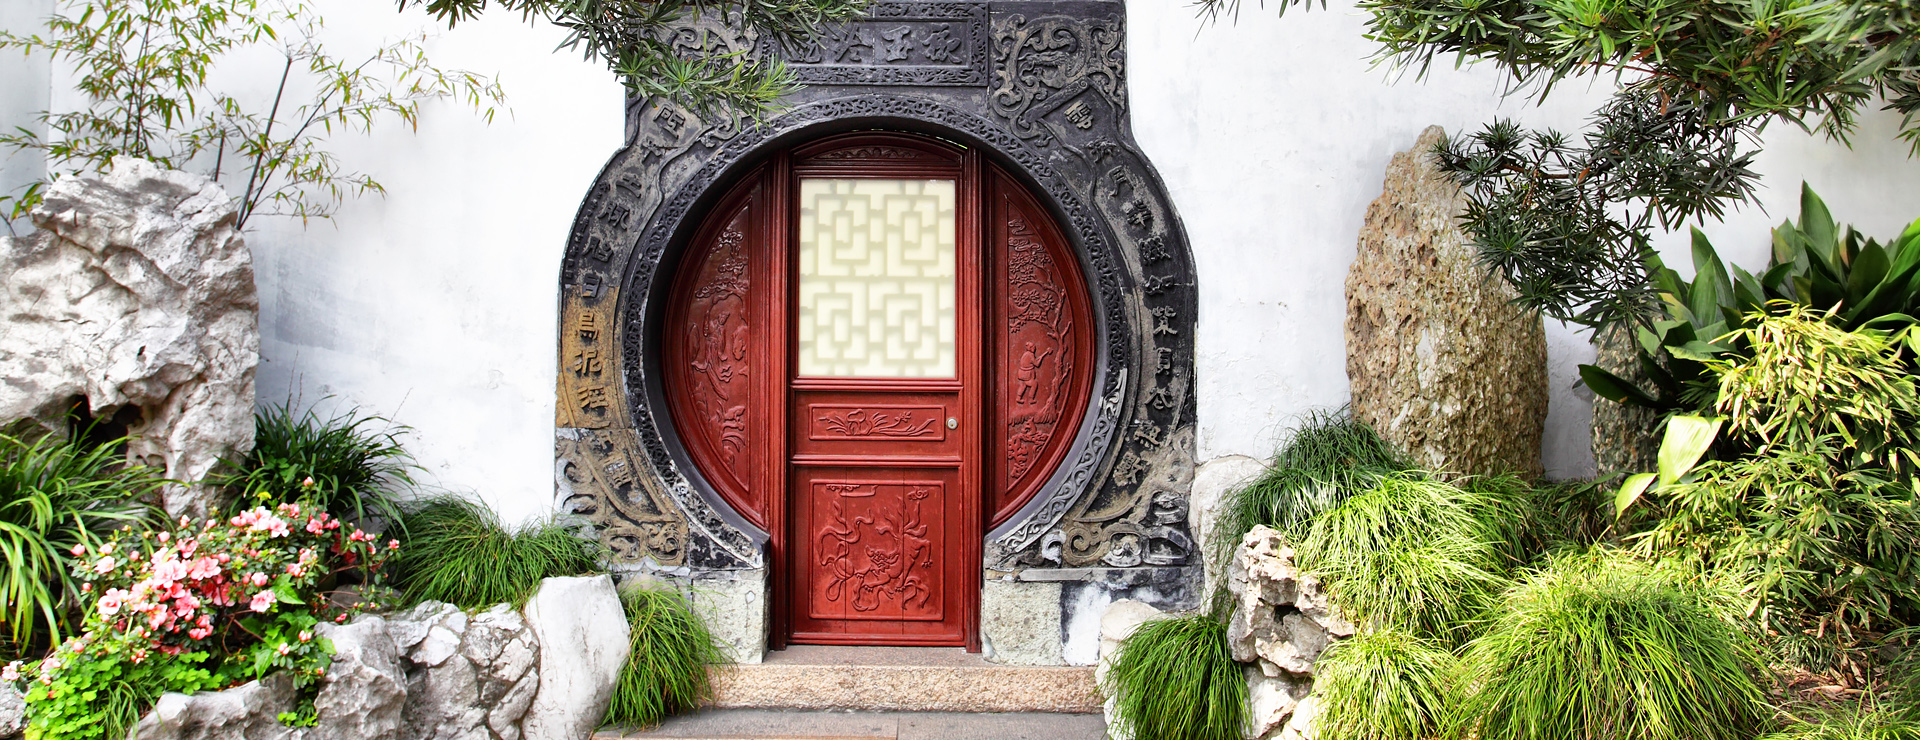 Shanghai – Yu Garden